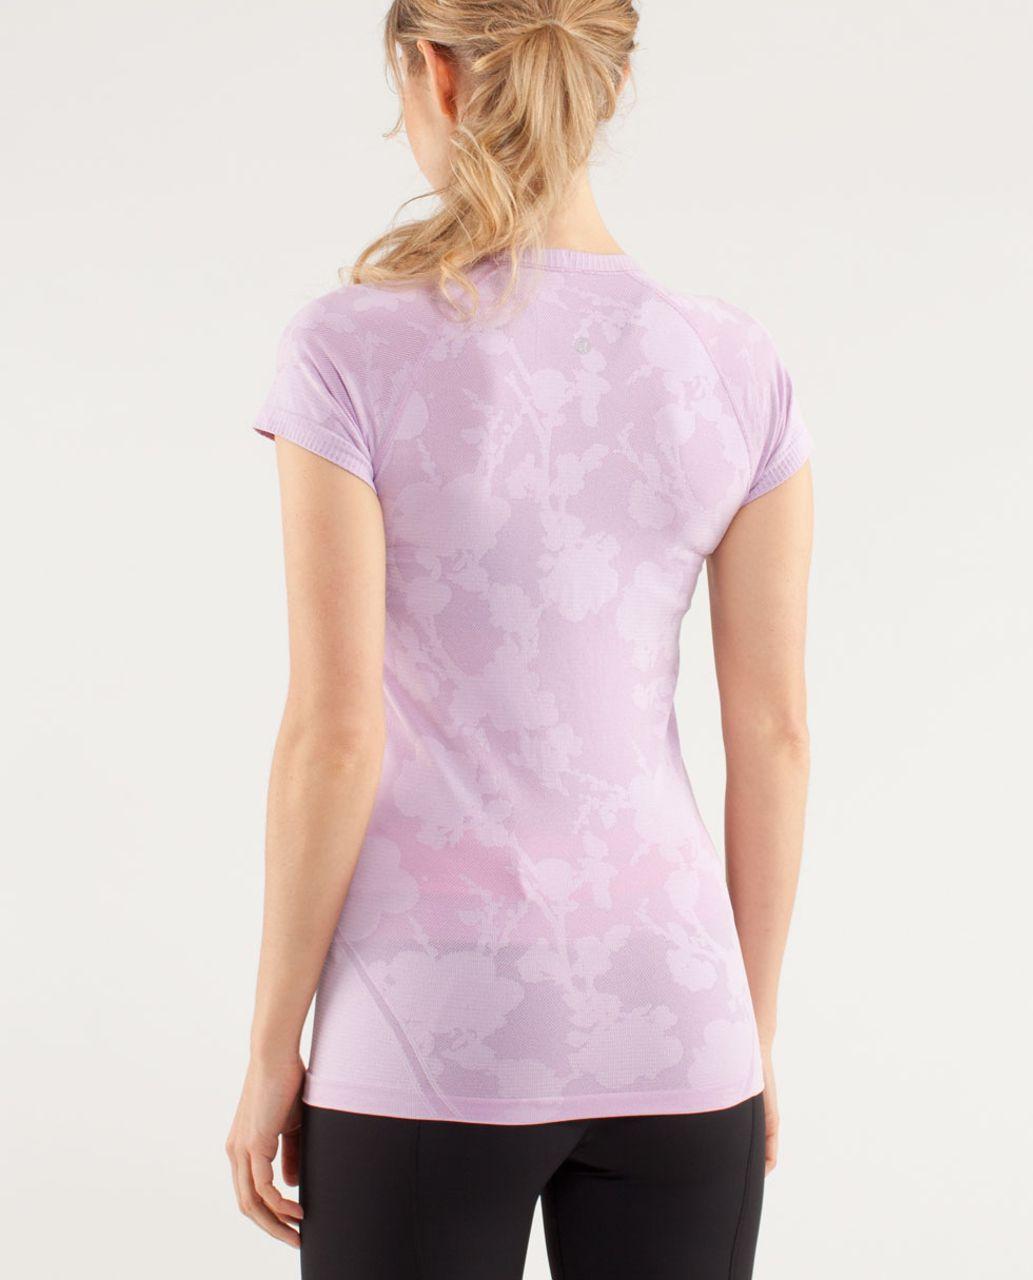 Lululemon Run:  Swiftly Tech Short Sleeve *Special Edition - Rose Quartz